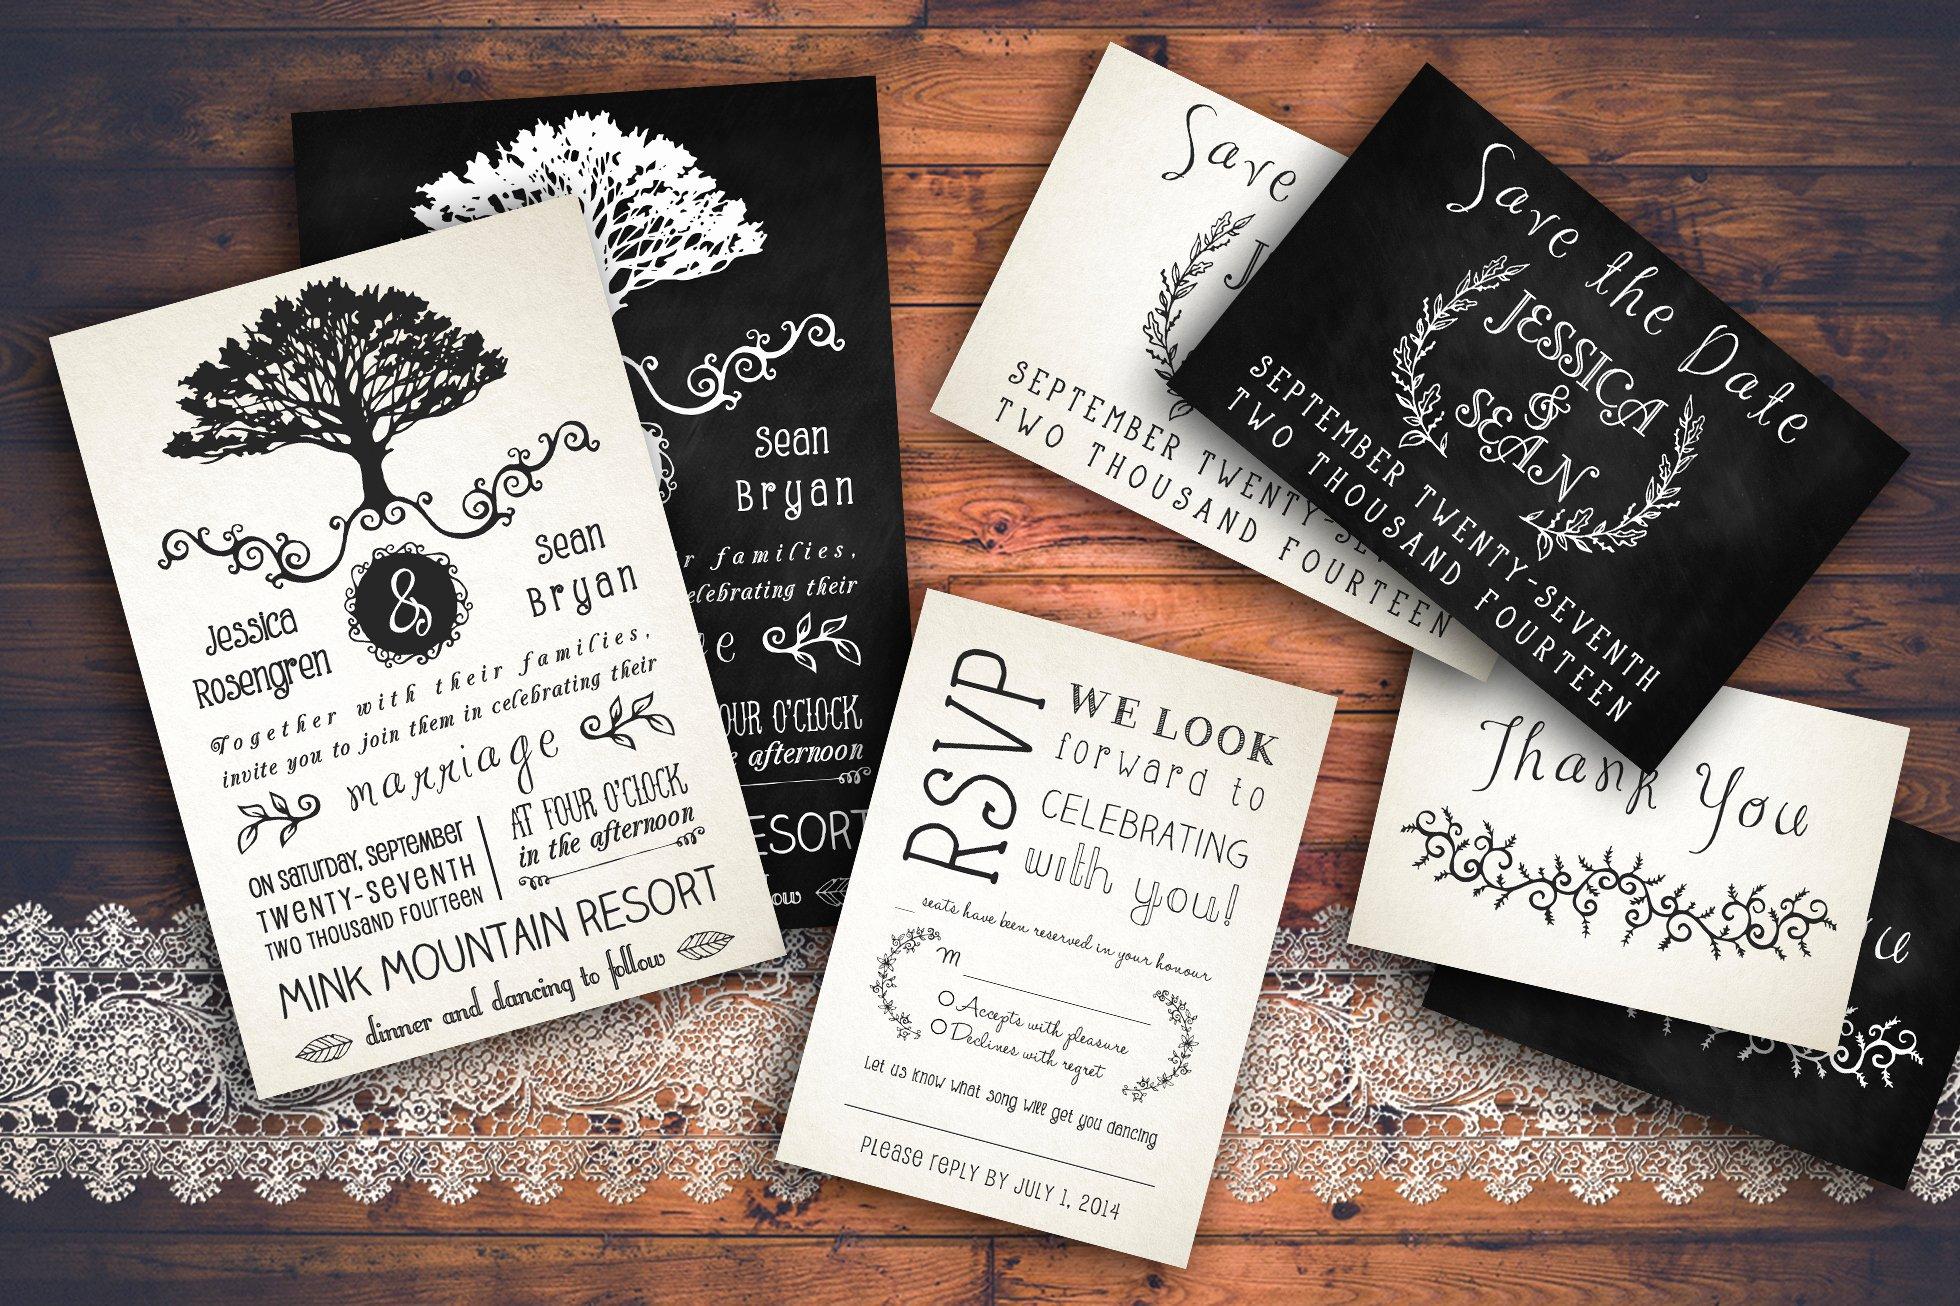 Rustic Wedding Invitation Templates Inspirational Rustic Wedding Invitation Pack Invitation Templates On Creative Market